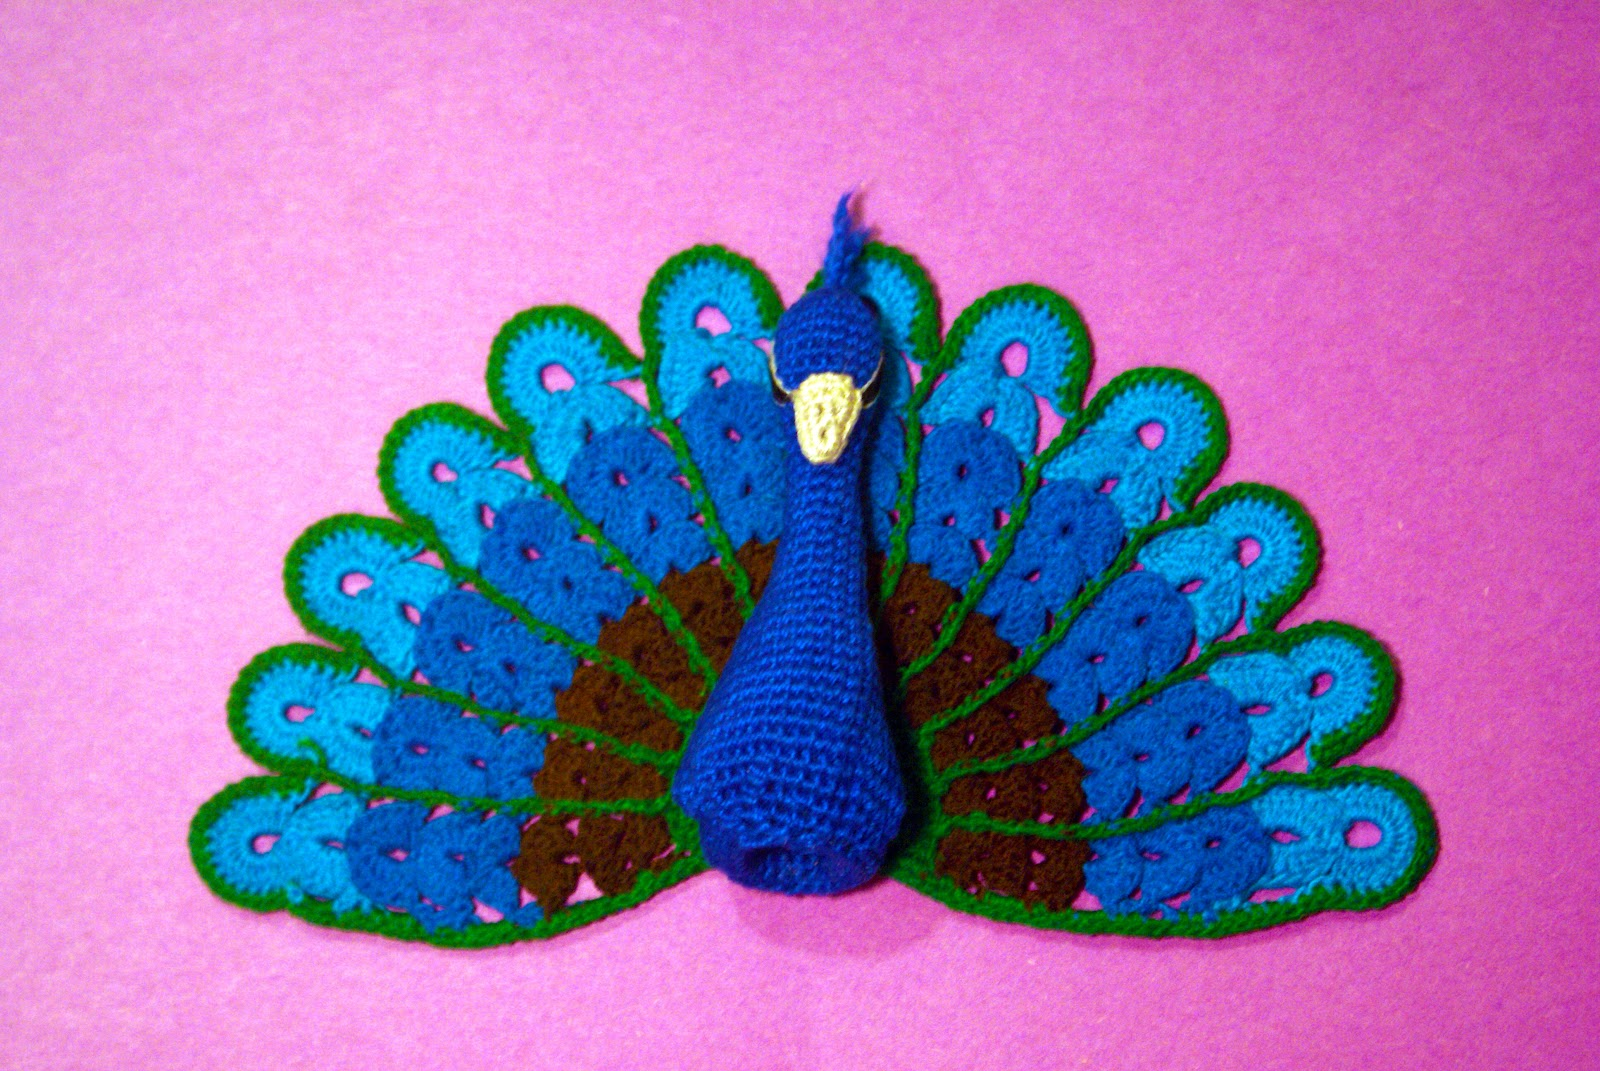 CrochetBot 3000: Peacock